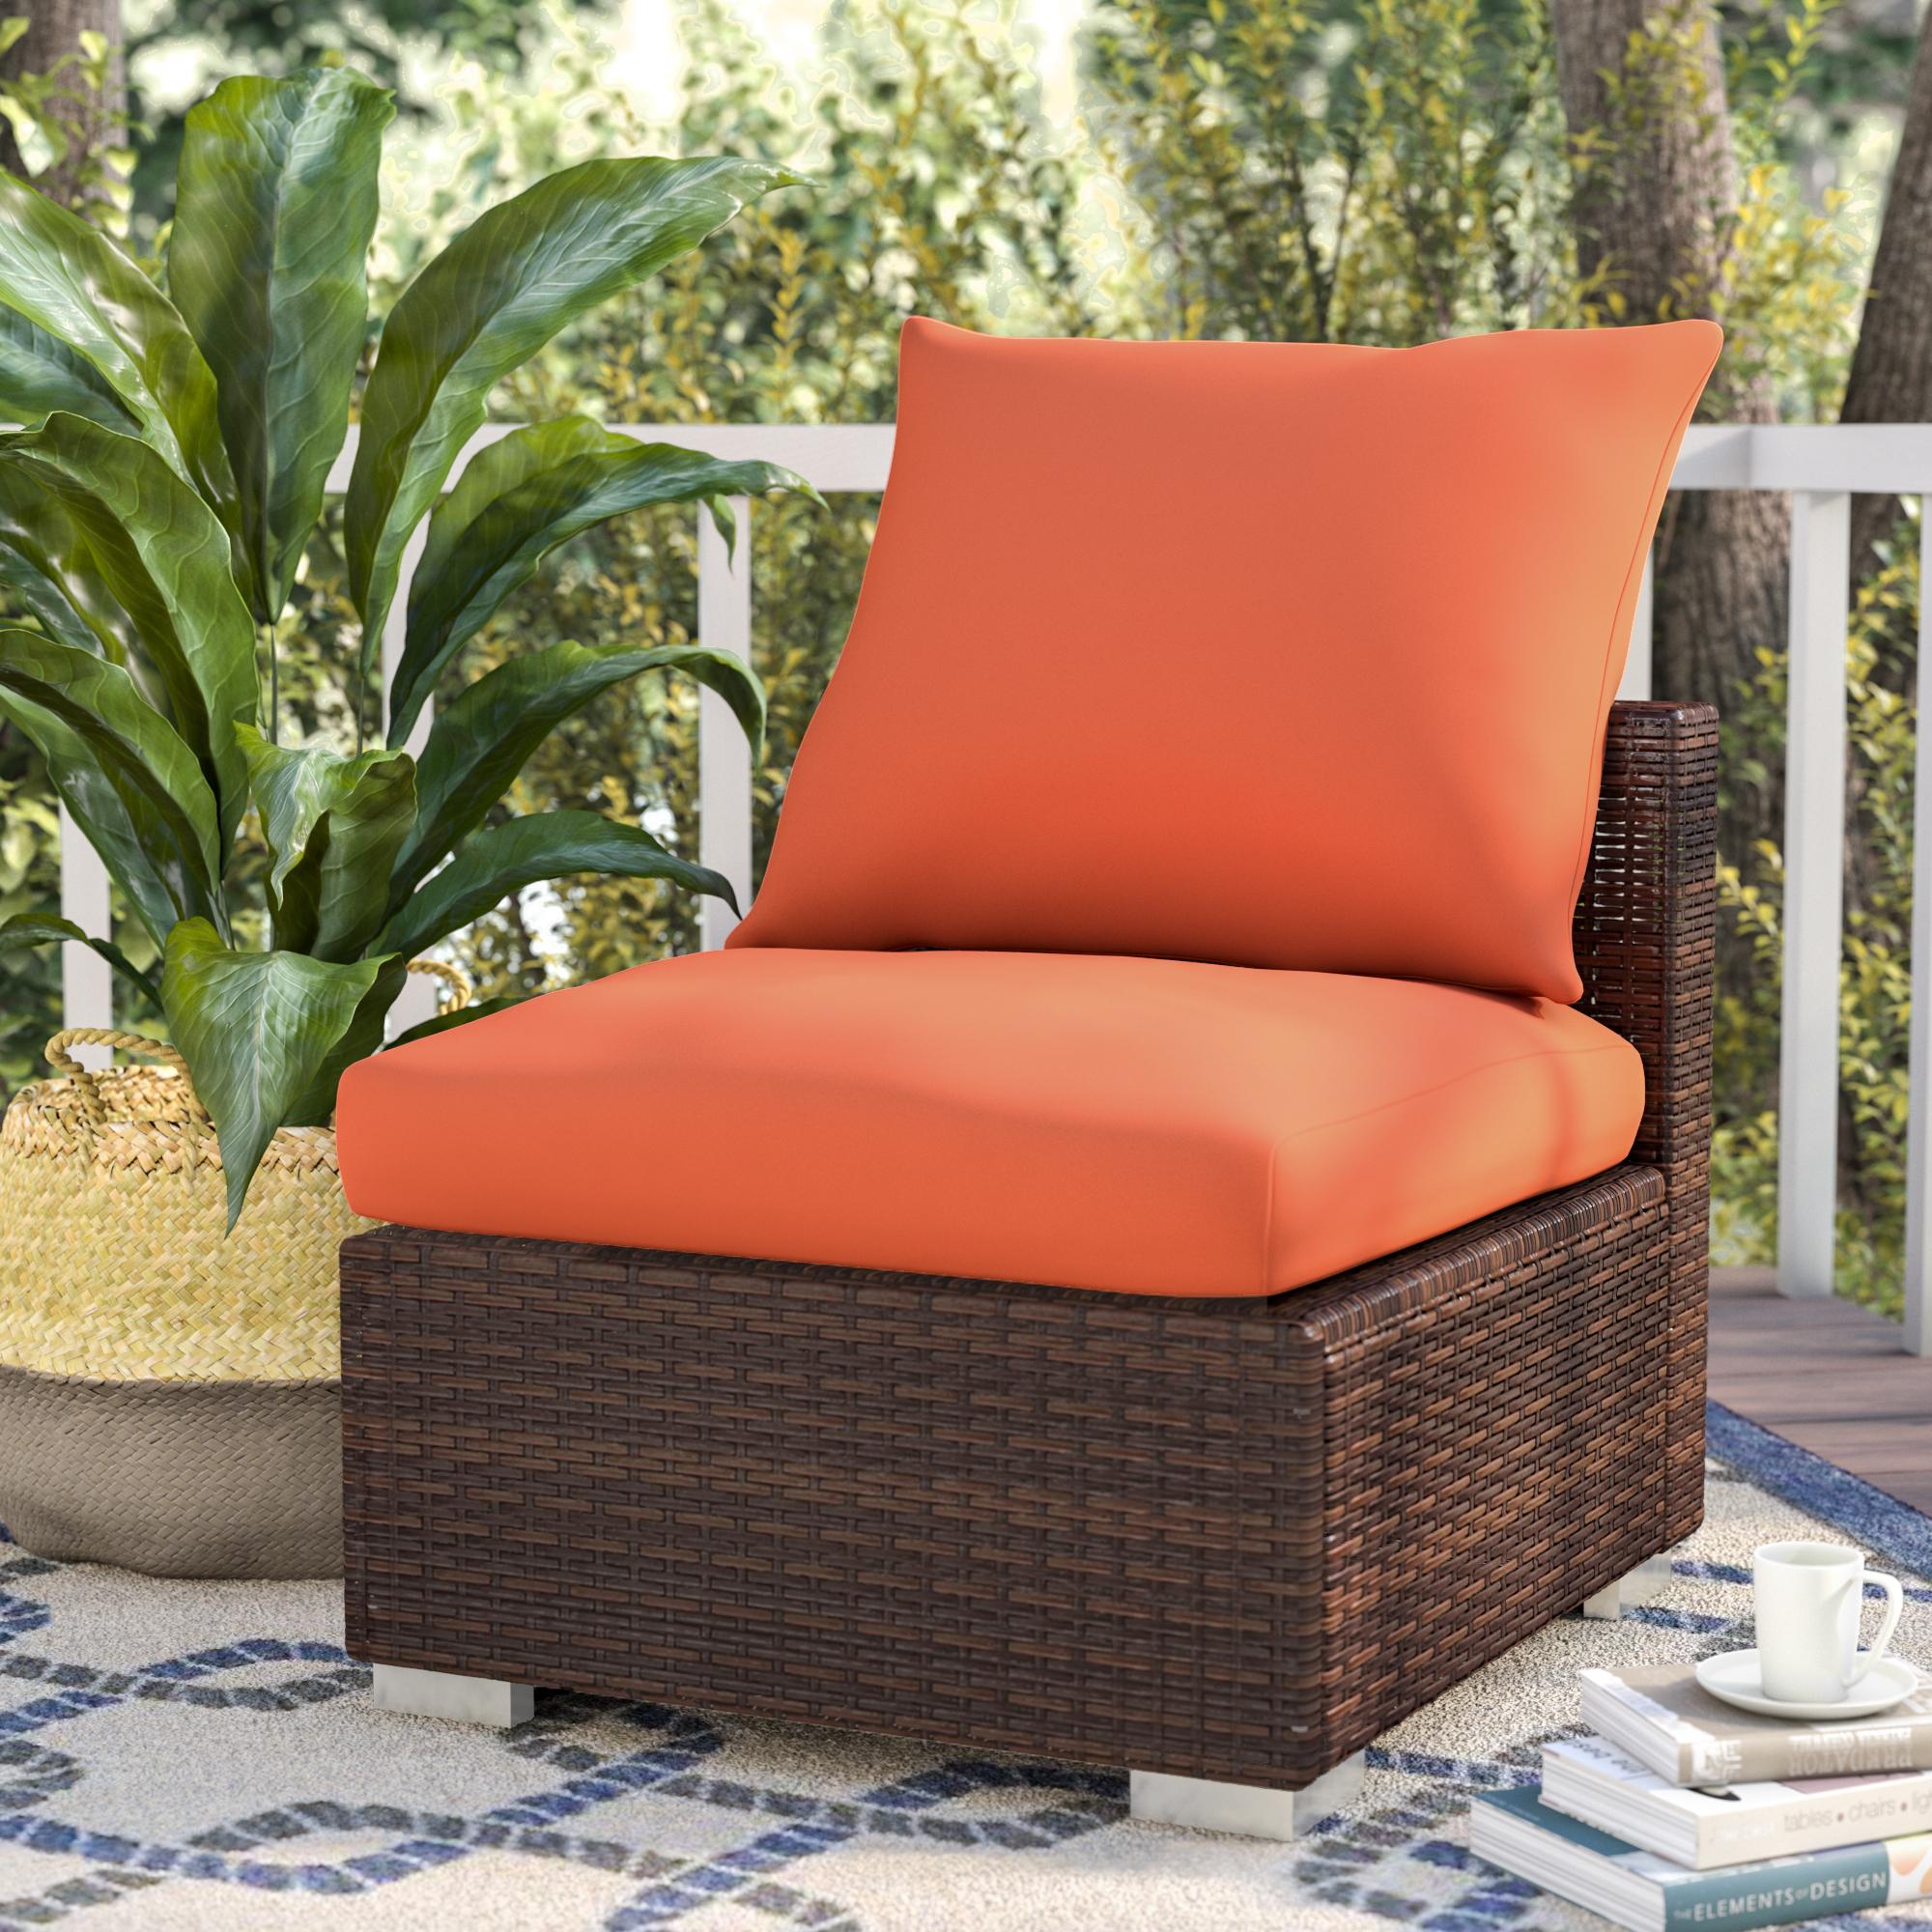 Sunbrella Patio Lounge Chairs